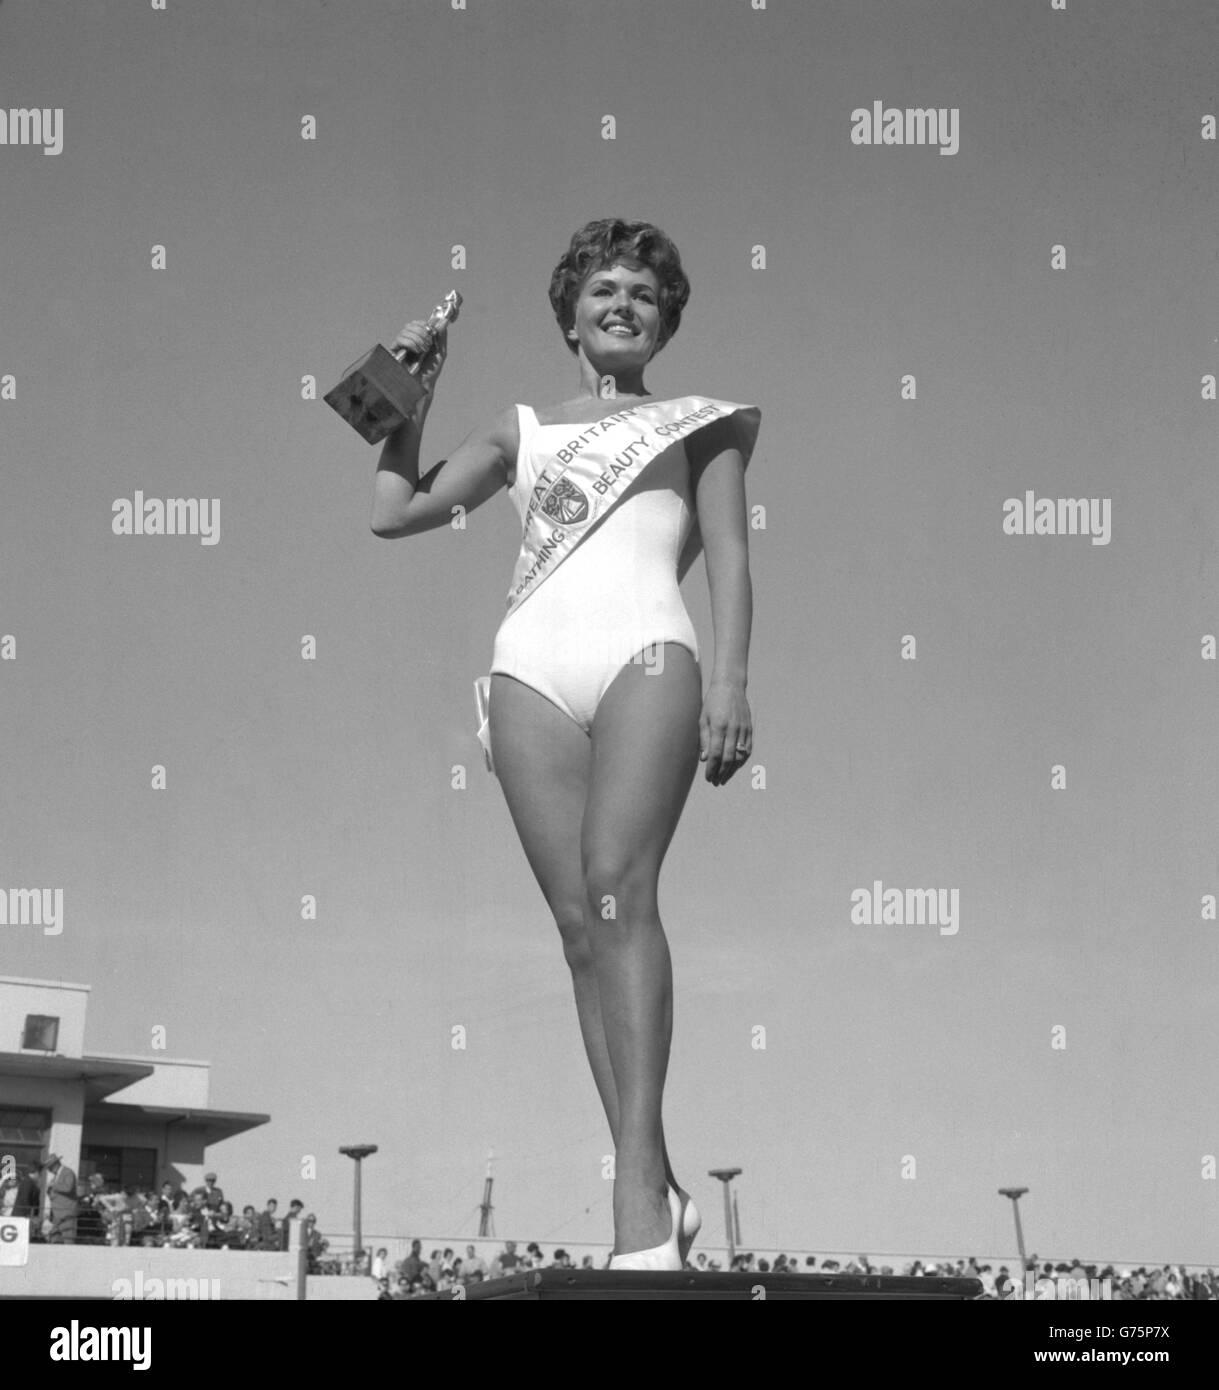 ac2f7cda27277 Fashion and Beauty - Miss Great Britain - Joy Black - Morecambe - Stock  Image